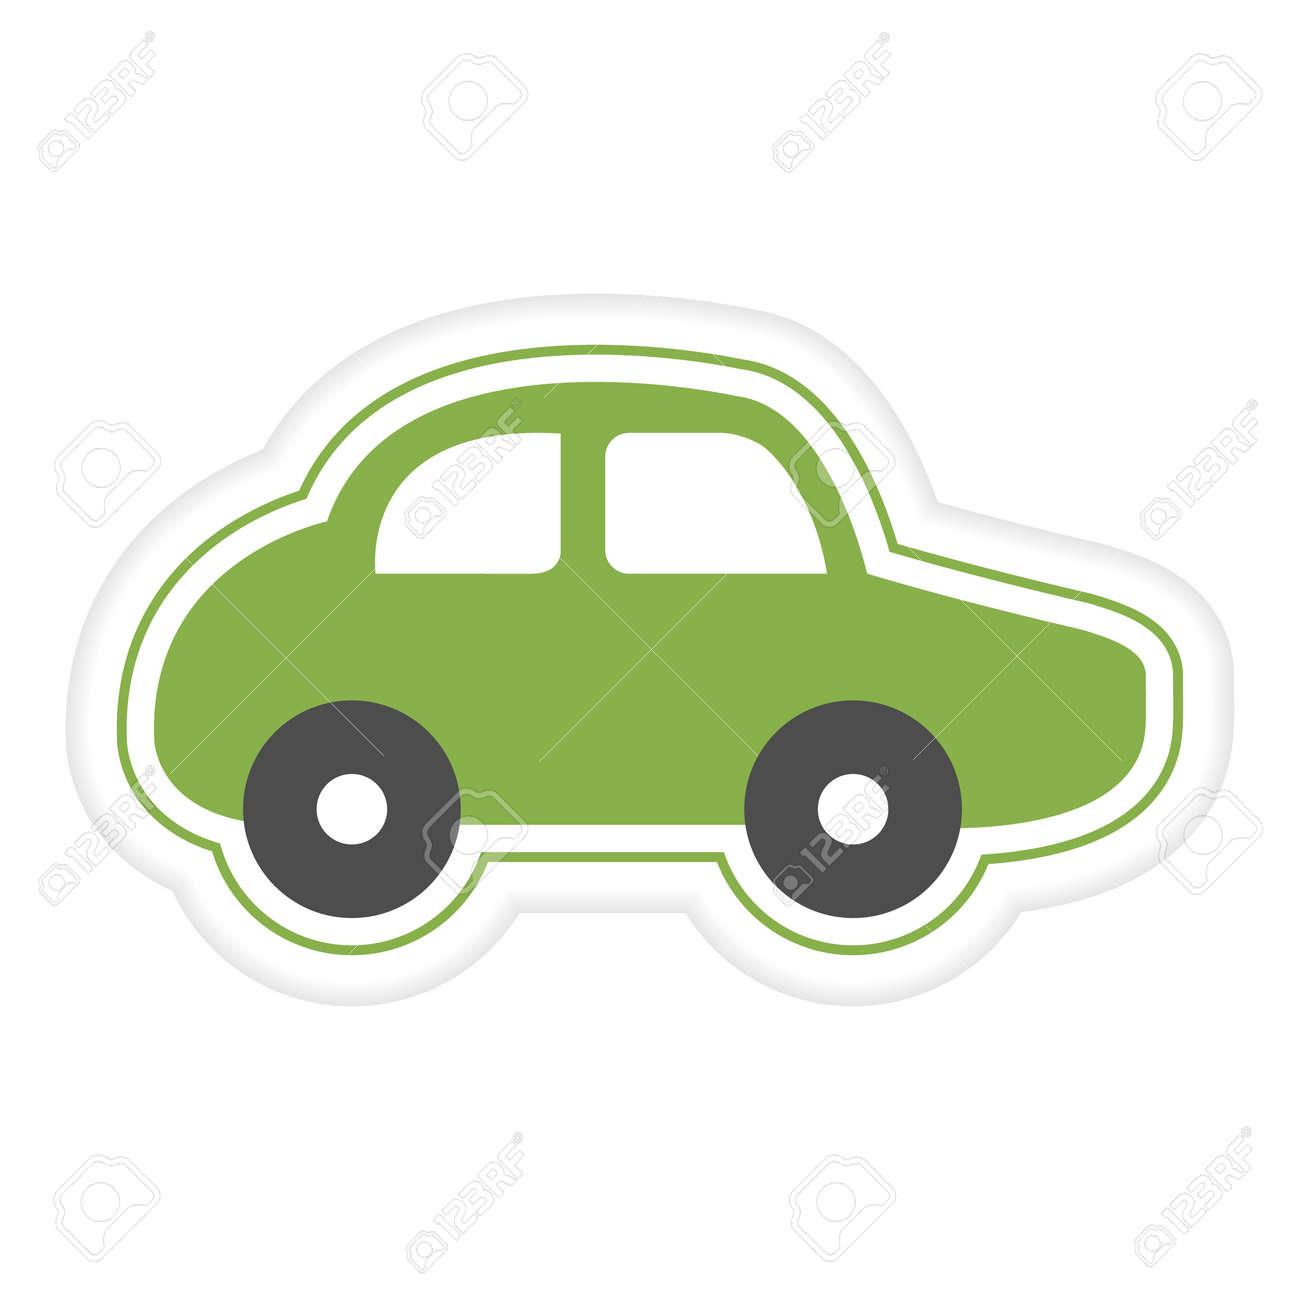 Vector illustration Kid toys Sticker Car. Primary school, elementary grade, kindergarten. Happy childhood. Activity. Game. Play. Automobile Vehicle Transportation Design for print - 170250153